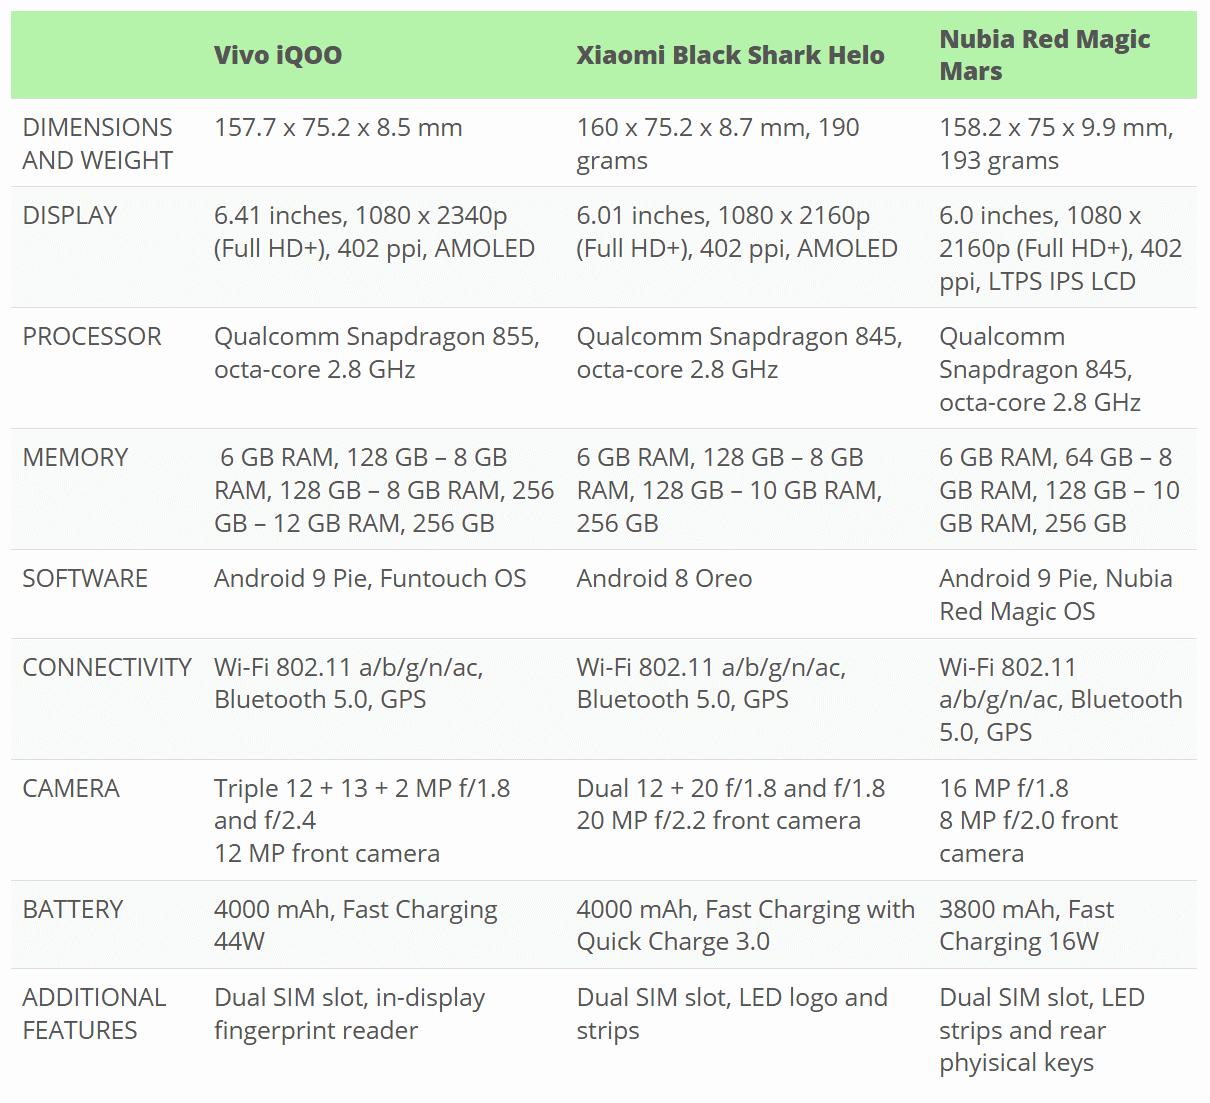 Vivo iQOO vs Xiaomi Black Shark Helo vs Nubia Red Magic Mars